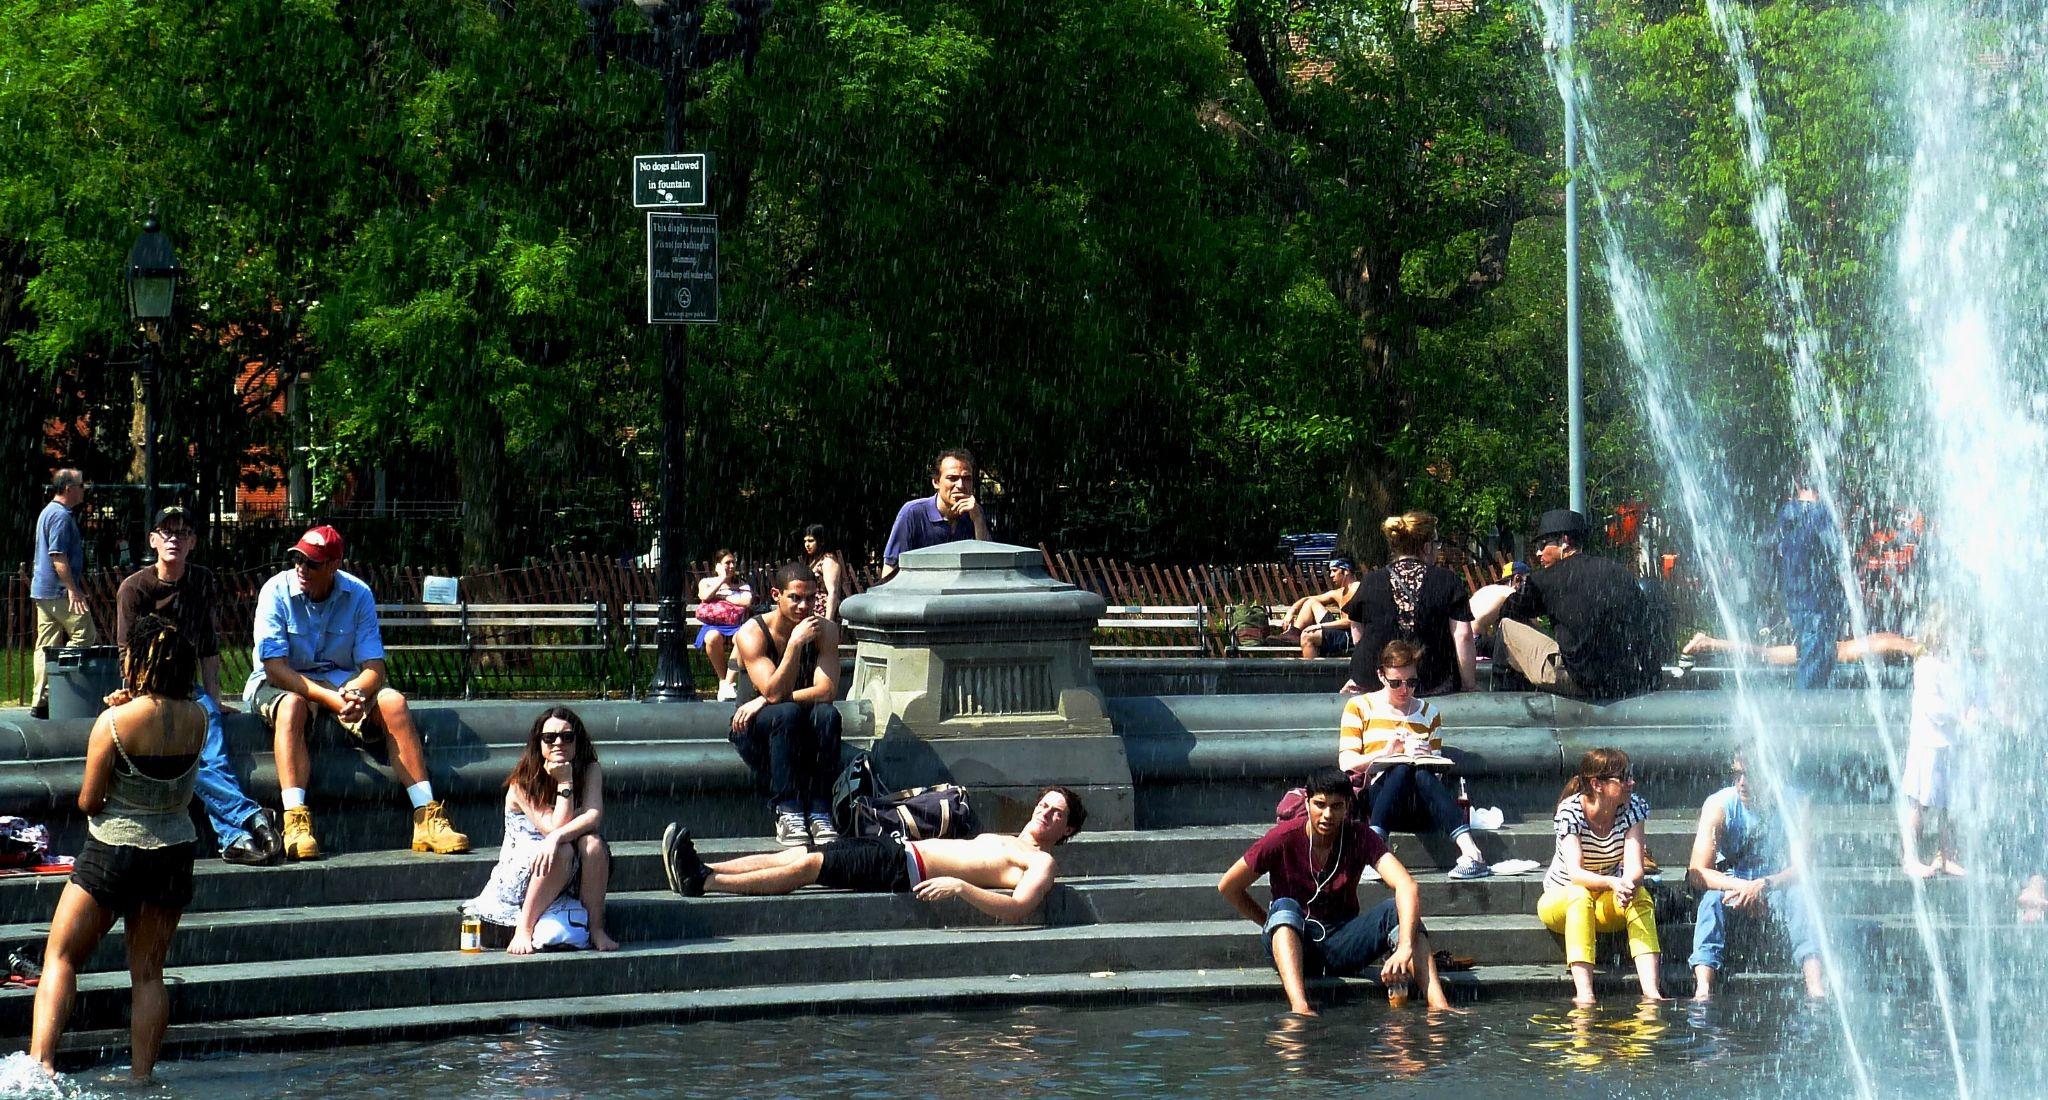 Around the fountain at Washington Sq. Park, Greenwich Village, NYC. by Anton Agalbato